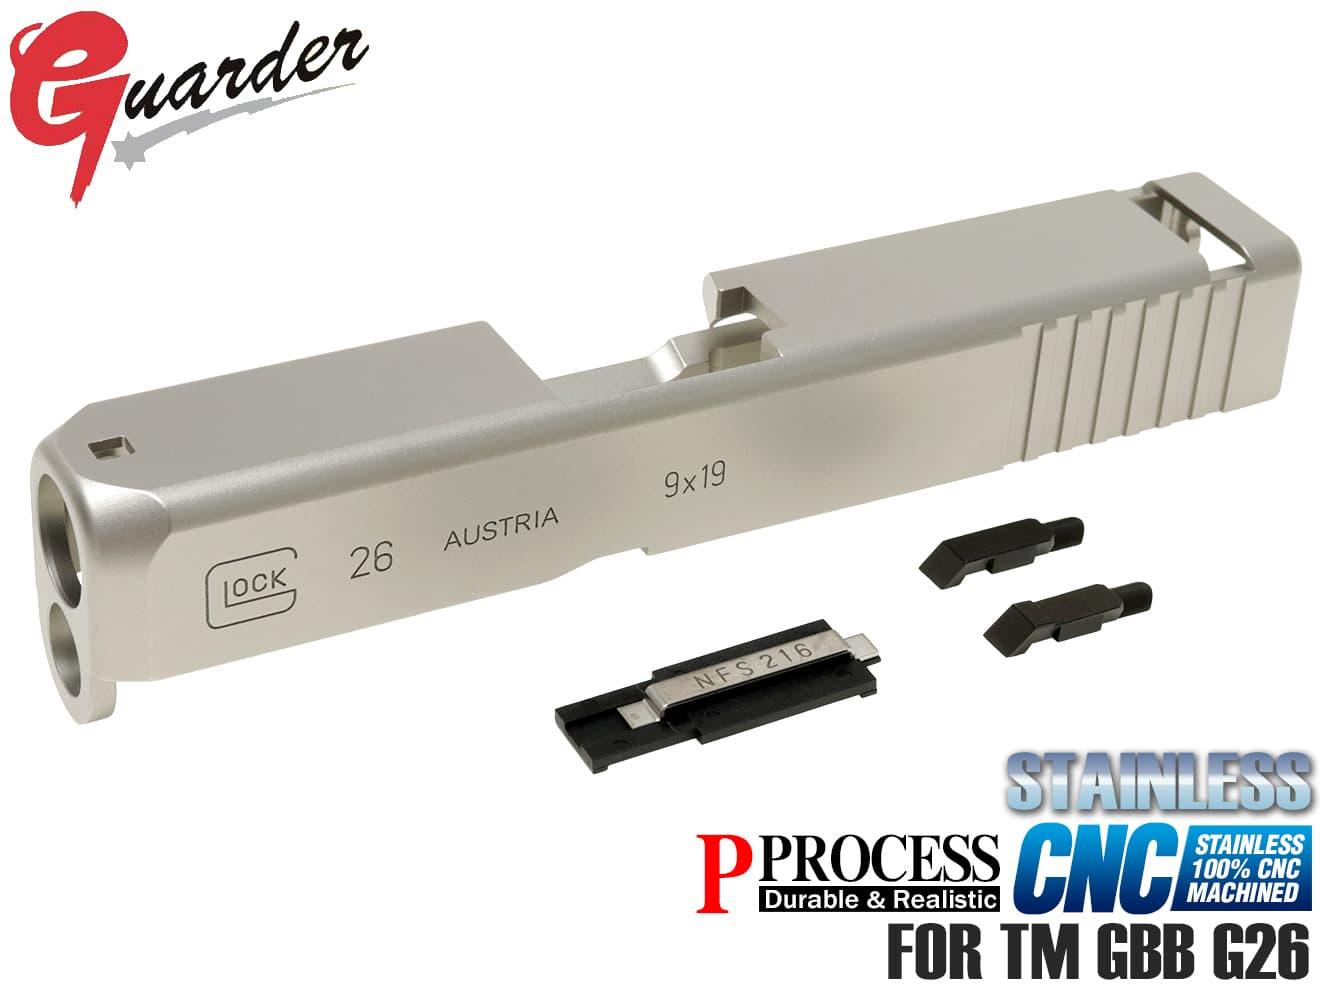 GLOCK-74(SV)■【限定モデル!100%CNC加工】GUARDER(ガーダー) スチールスライド&バレルキット◆マルイG26